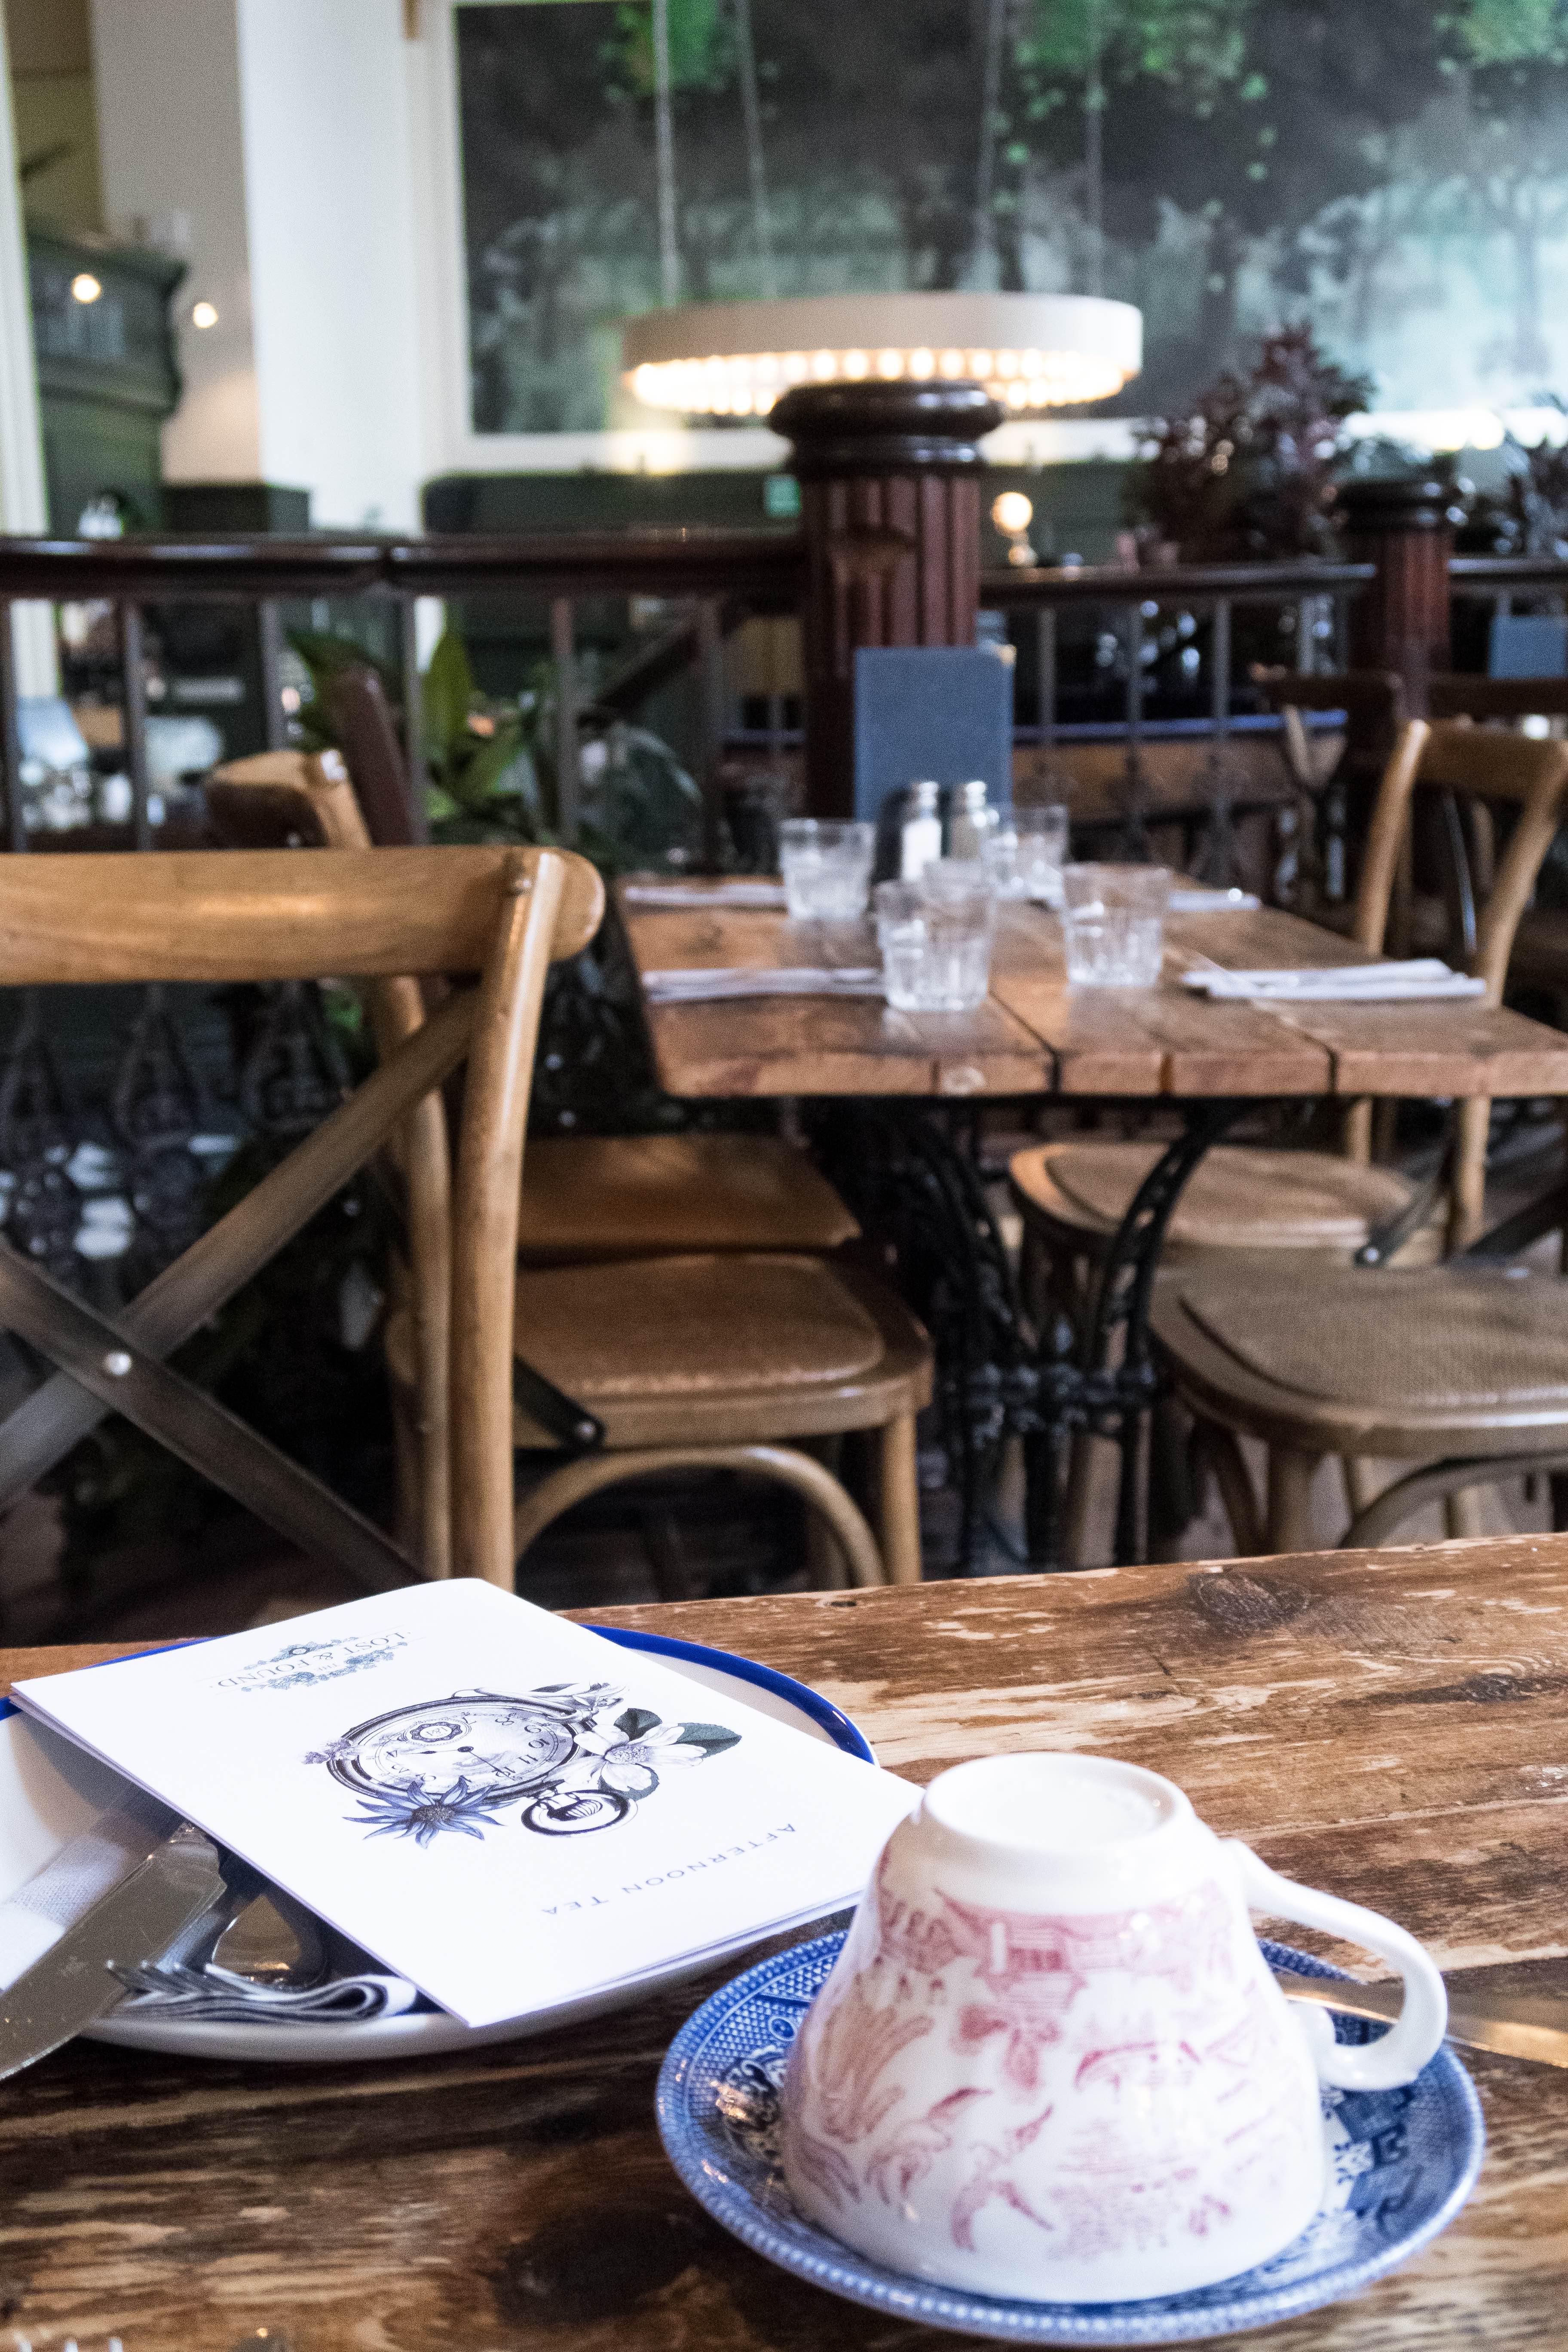 Afternoon tea at Lost & Found, Birmingham